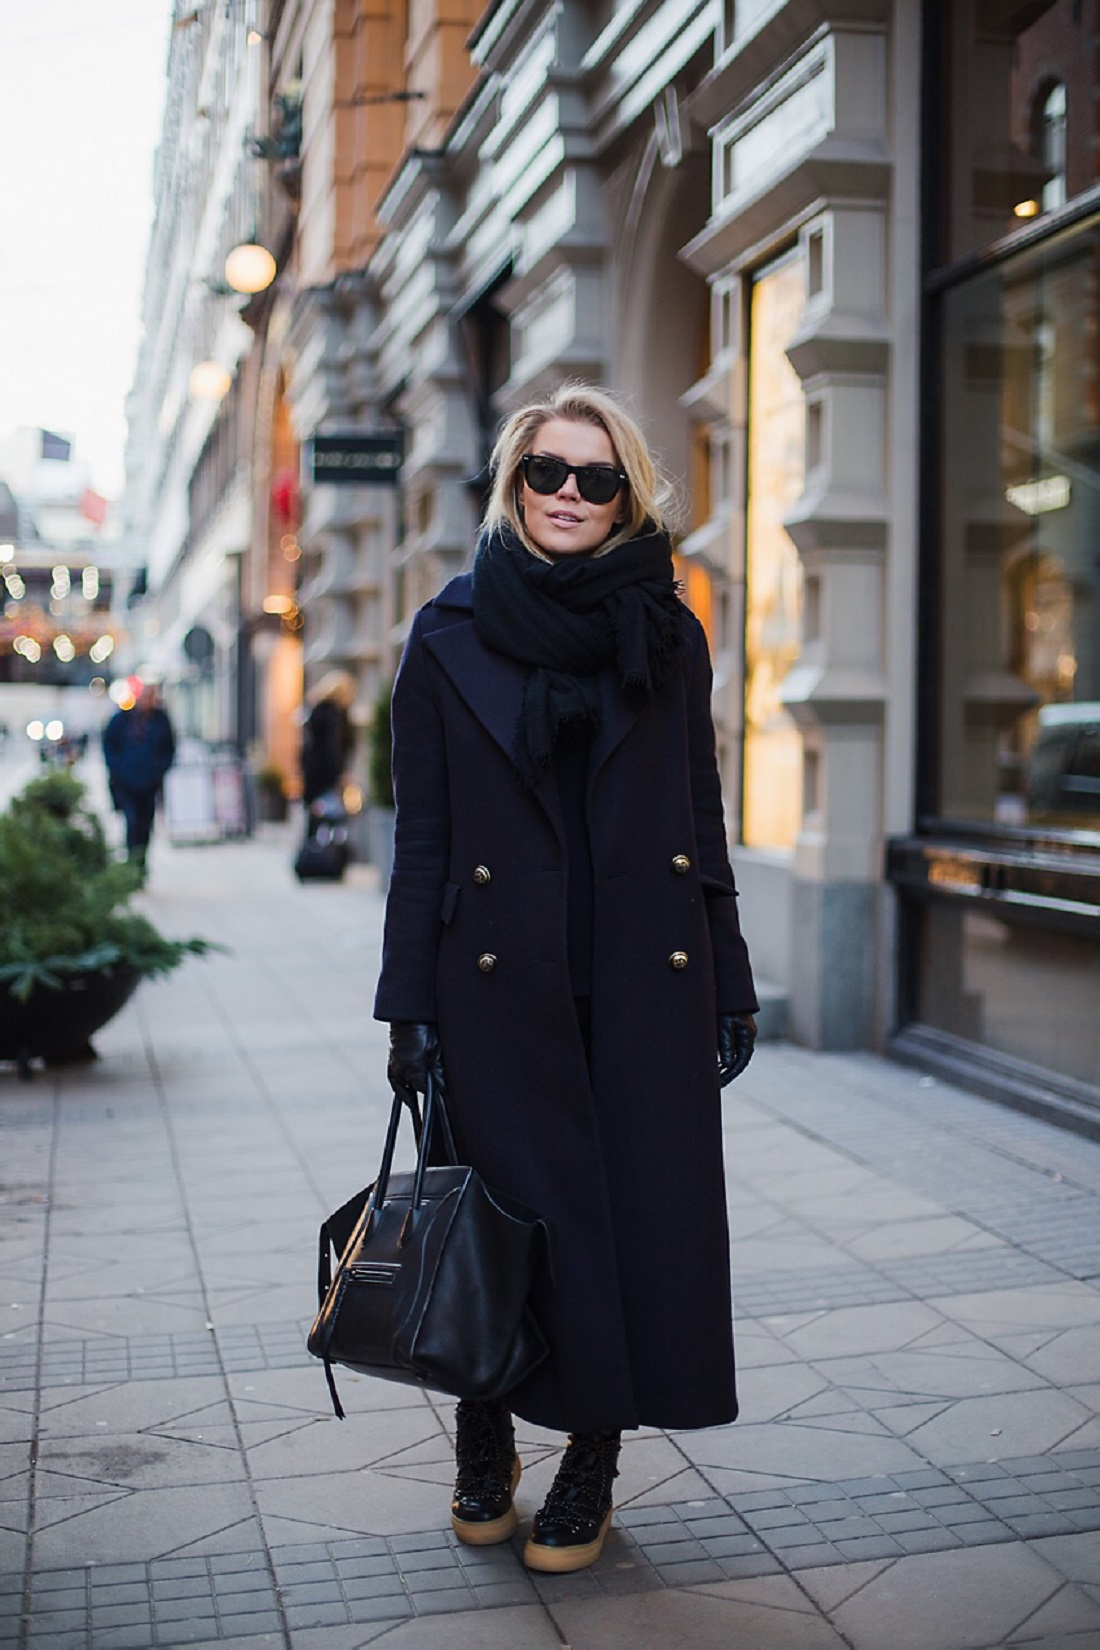 @projectfairytale: Perfect Fall Coats